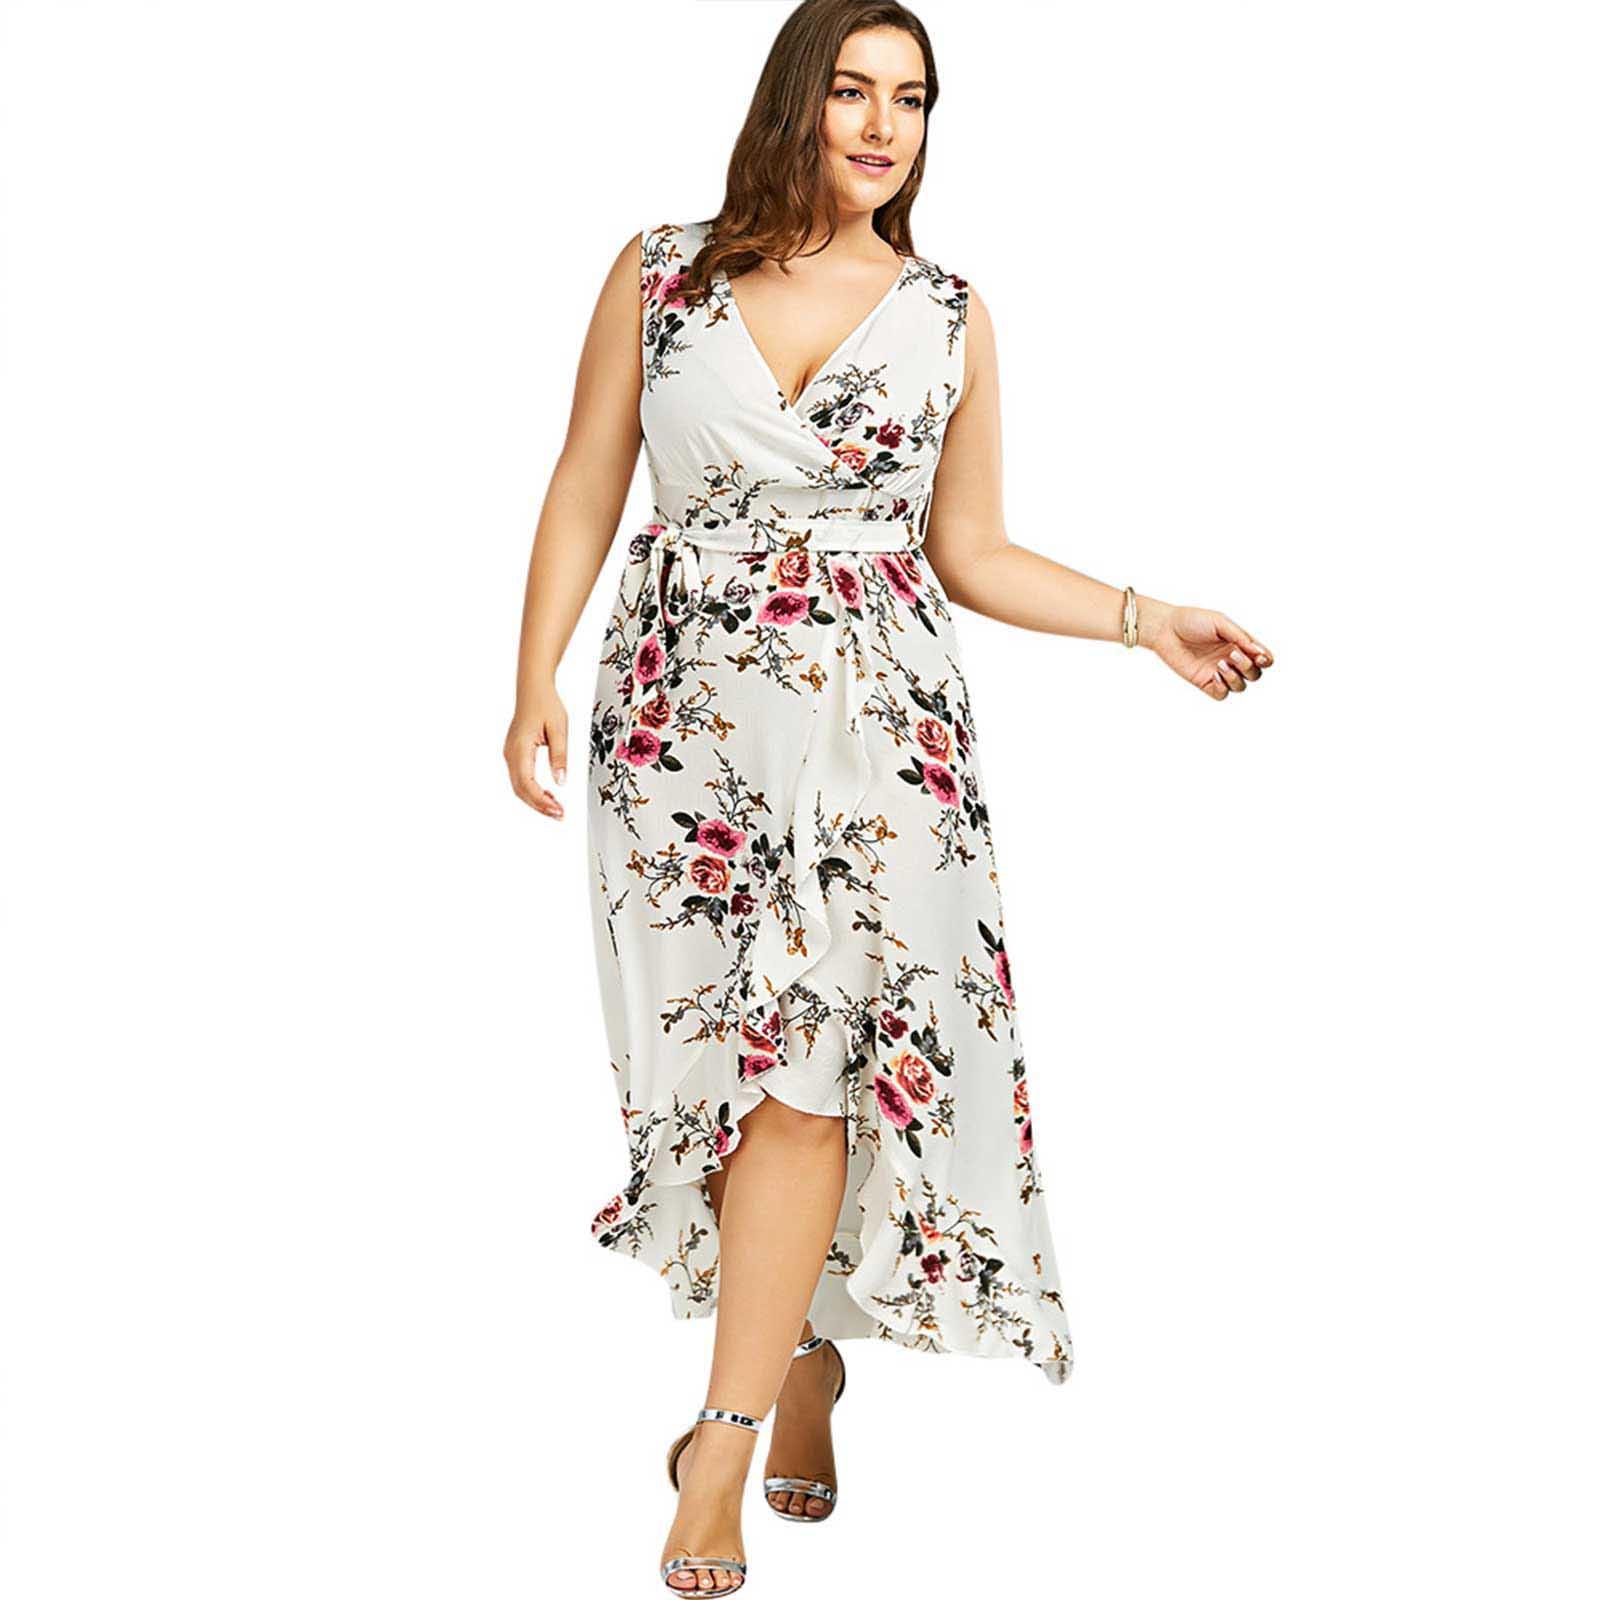 d9b85c14945e ... sleeveless-tiny-flower-print-high-low-high-waist-cocktail-party-evening- prom-tea-wedding-bridesmaid-summer-spring-ruffle-clubwear-a-line-dress- dresses-1